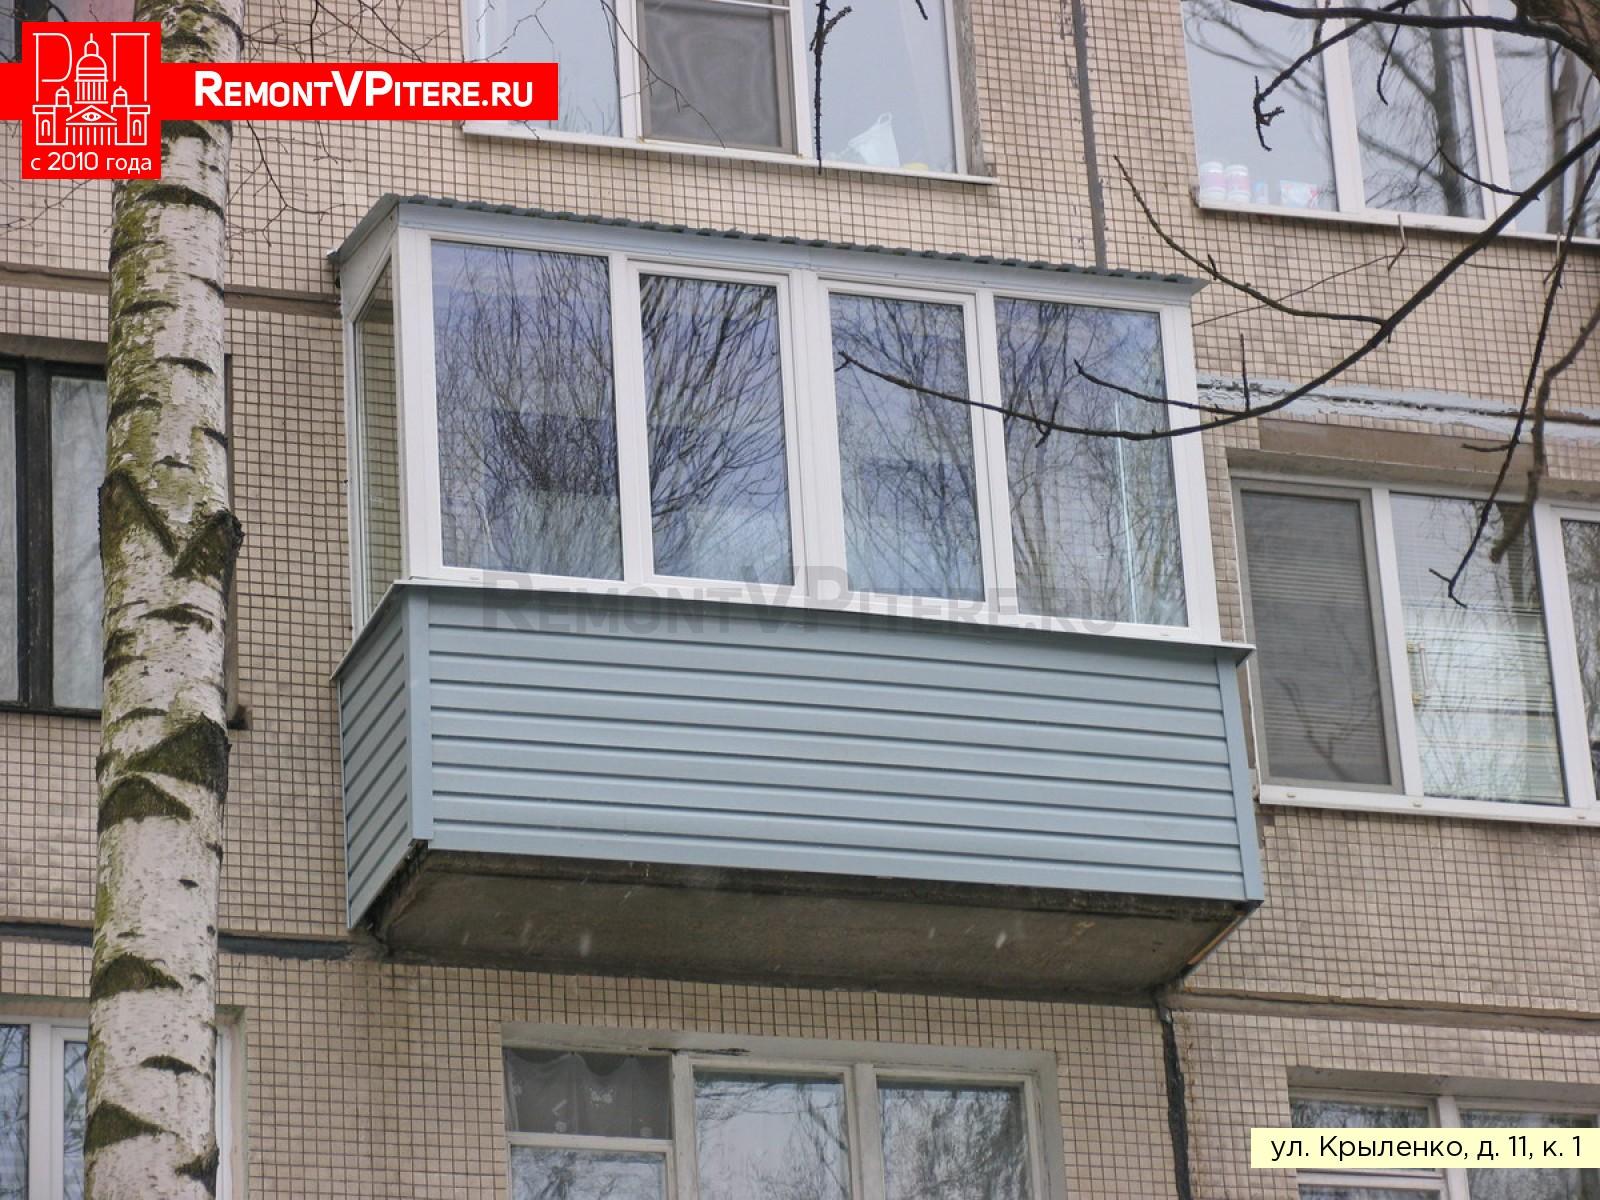 Балкон фотография фасада дома